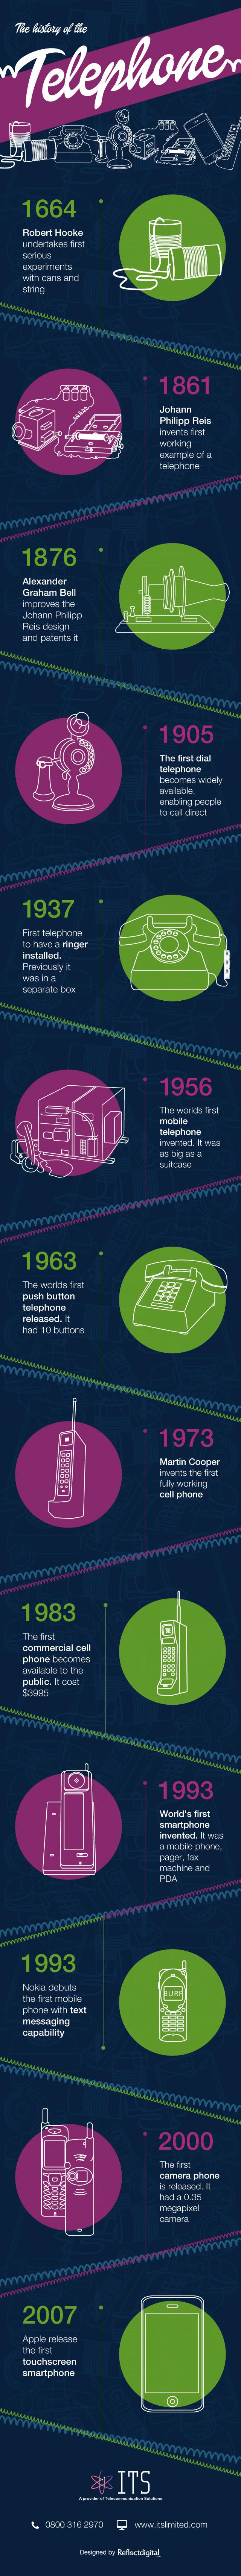 1412357519-genealogy-smartphone-infographic